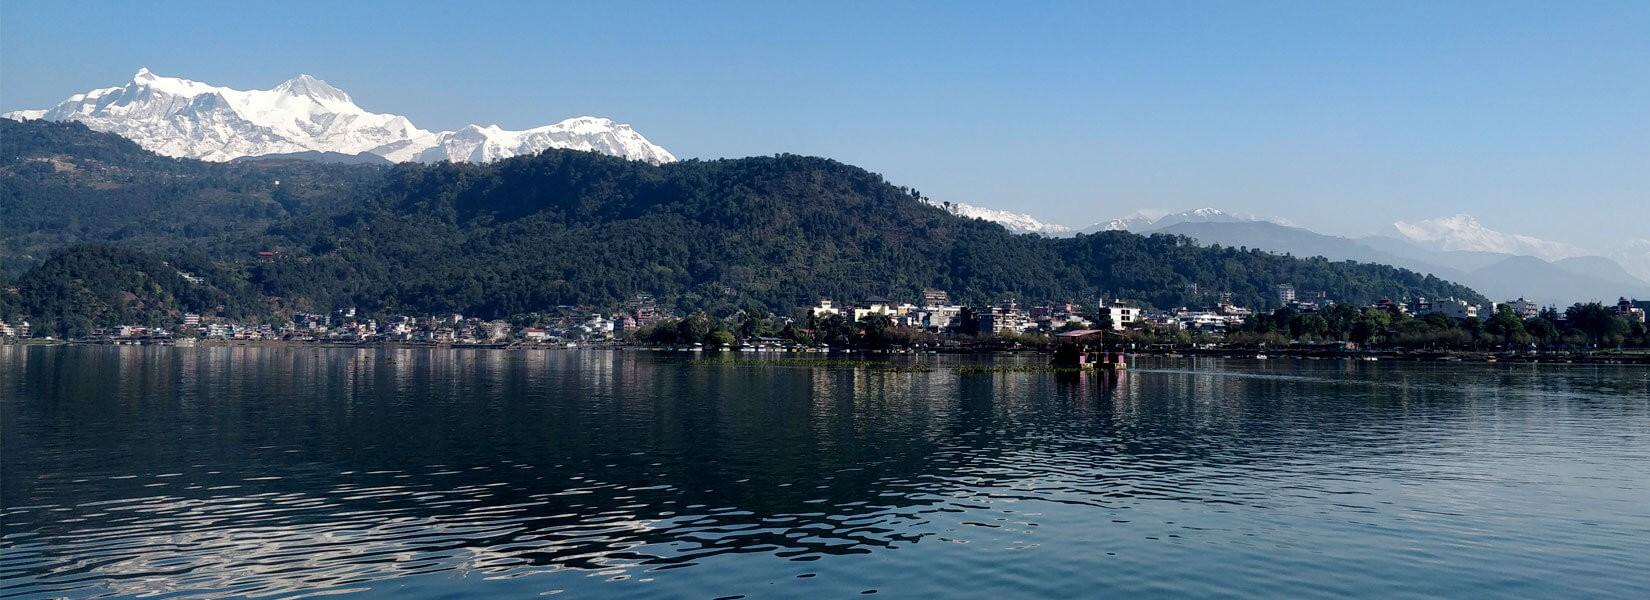 6 Days Kathmandu Pokhara Tour